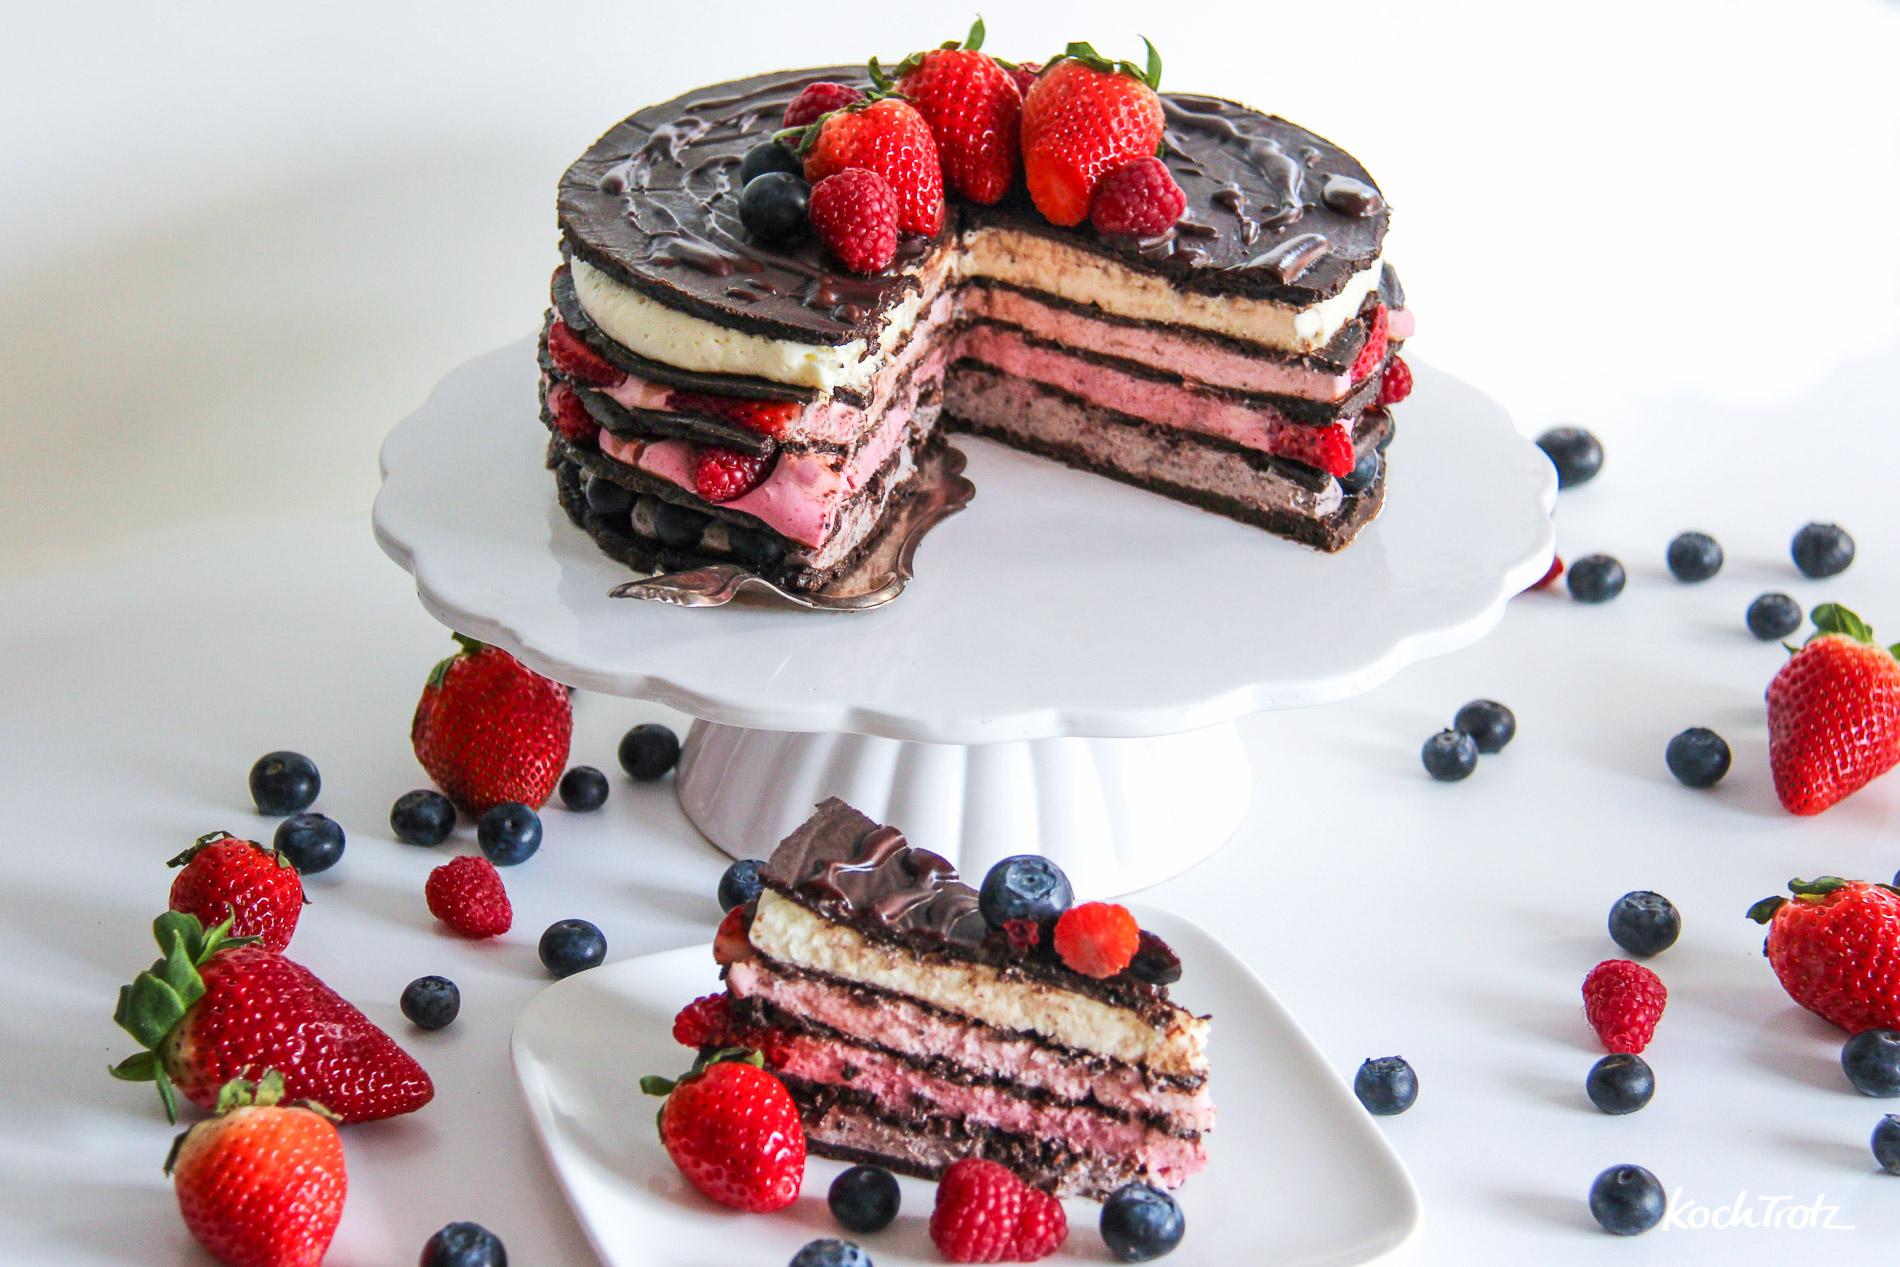 3-pauly-cremeo-torte-naked-cake-no-bake-glutenfrei-laktosefrei-27